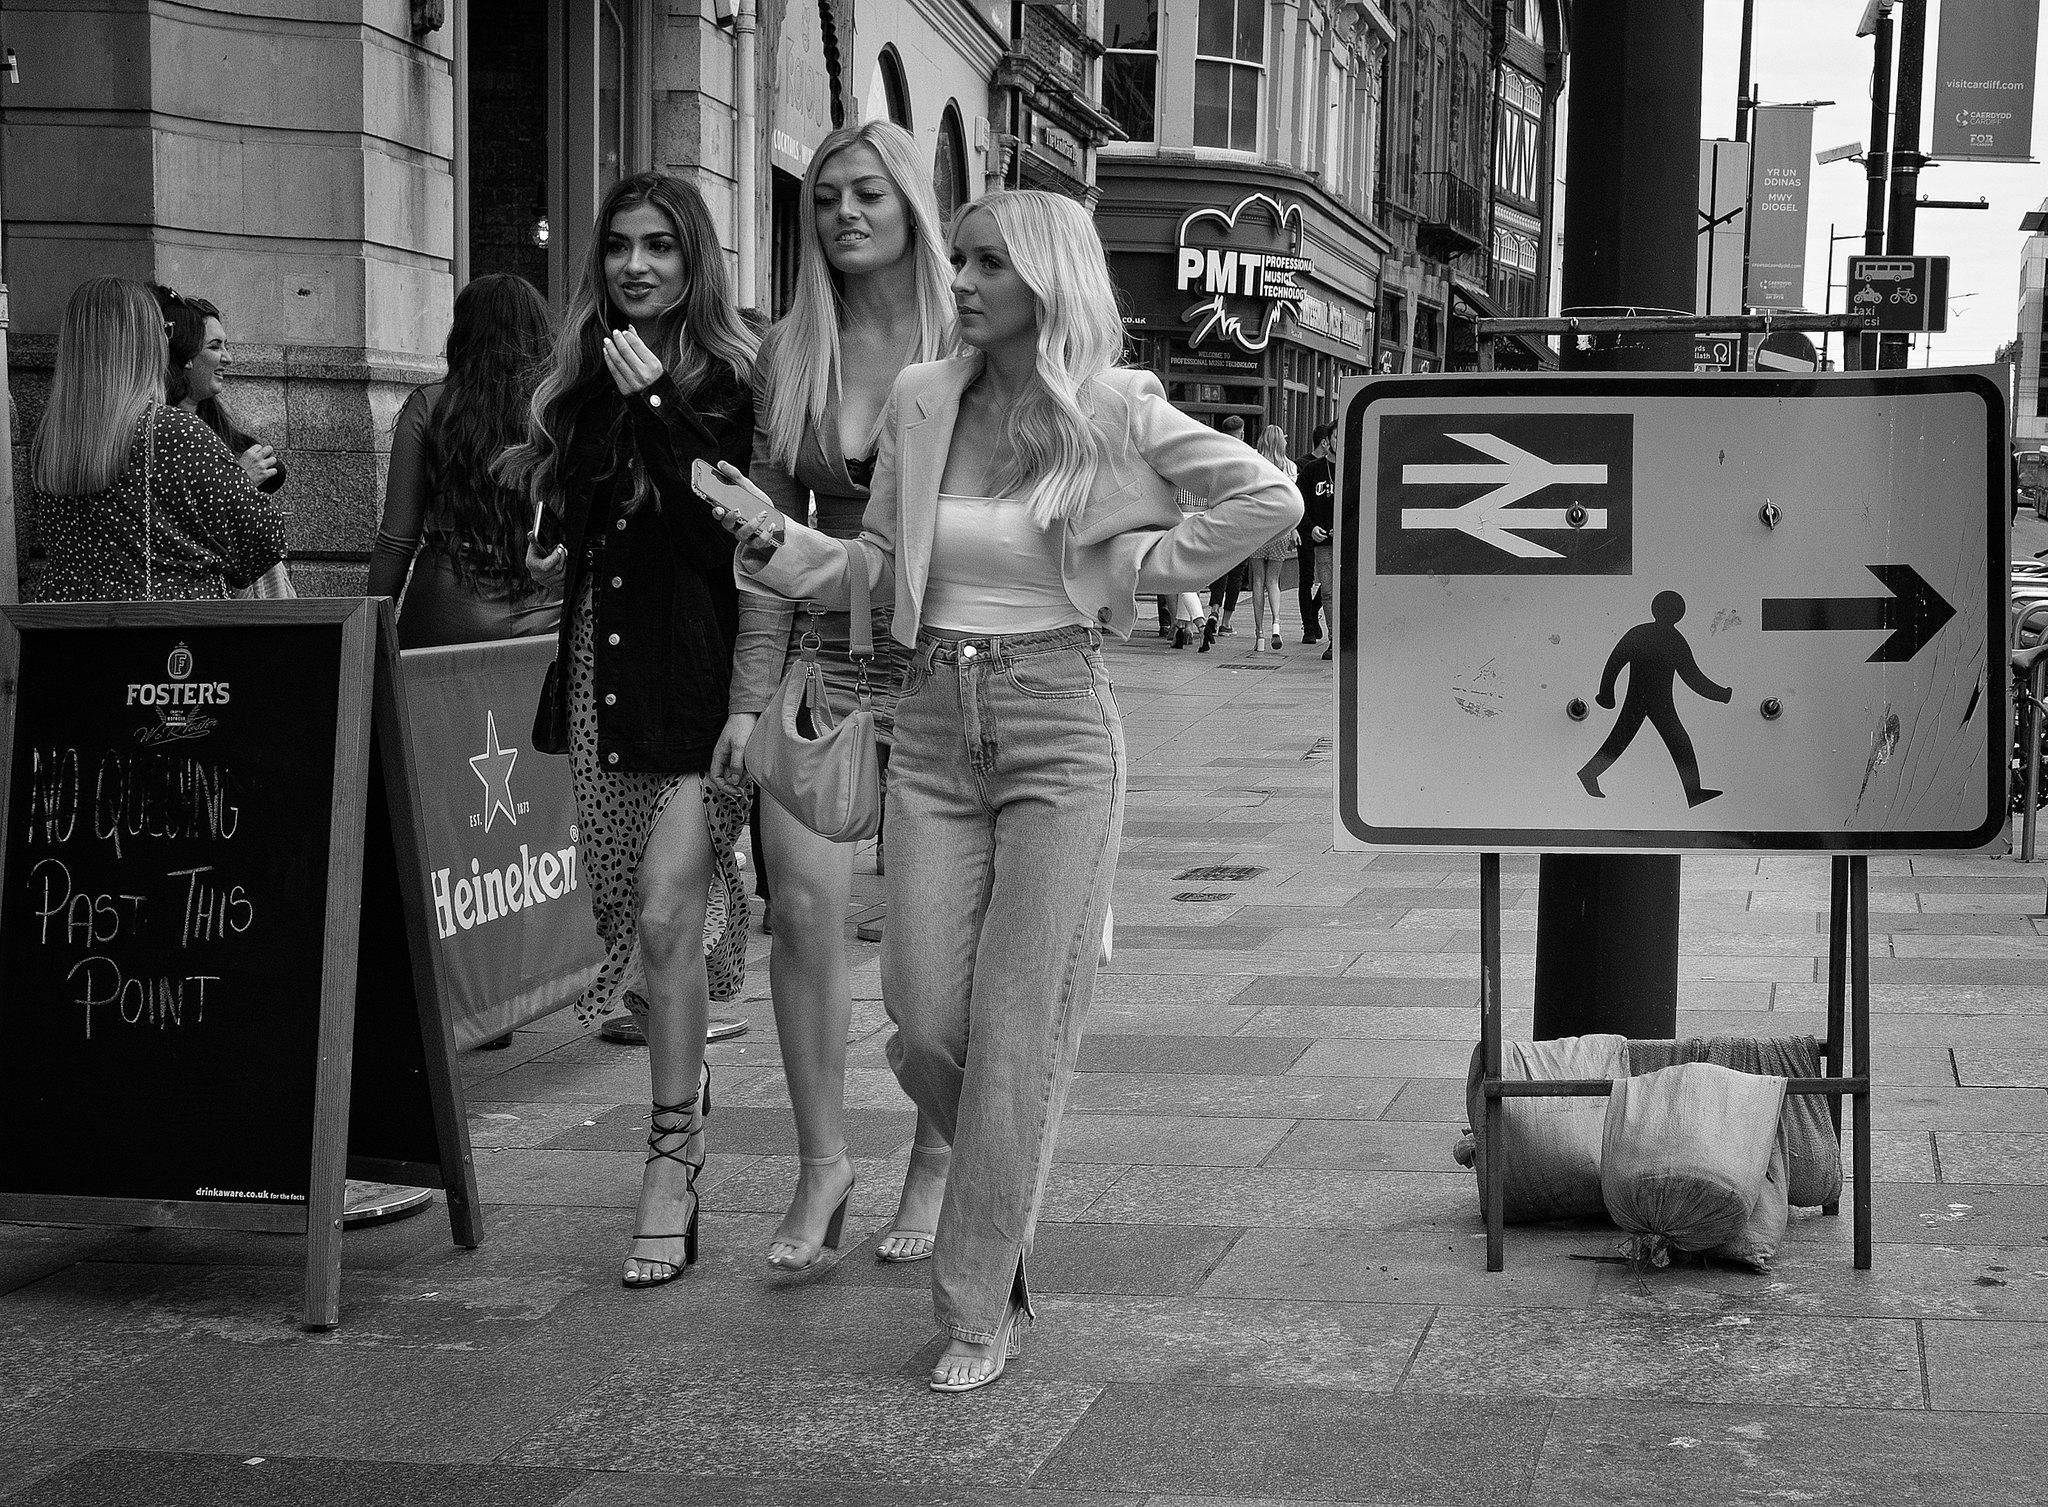 Walk this way ladies